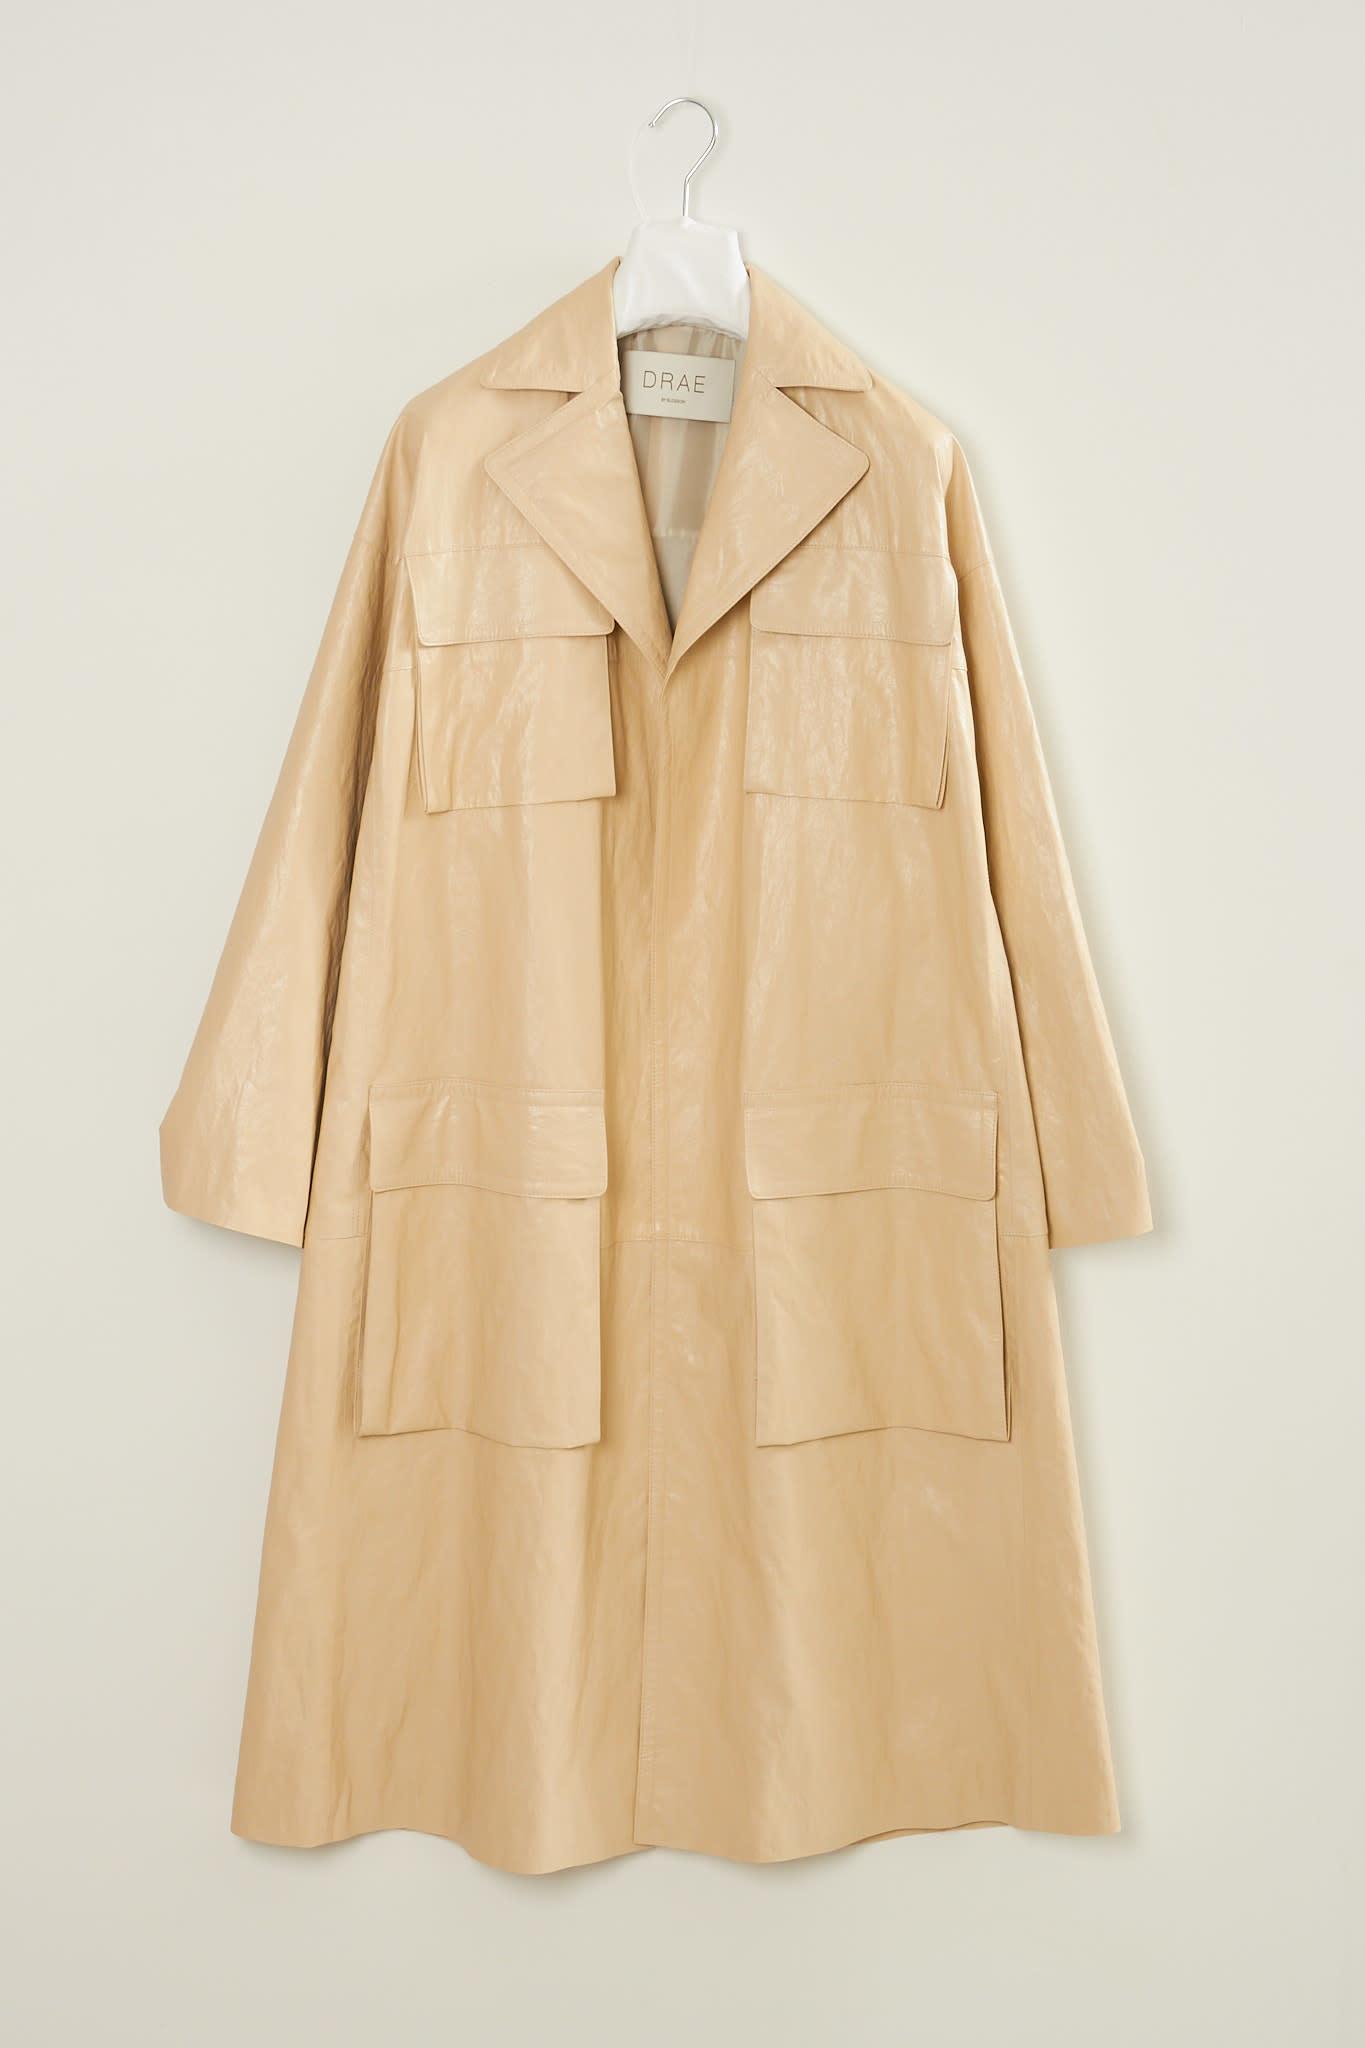 Drae - Faux leather pocket coat